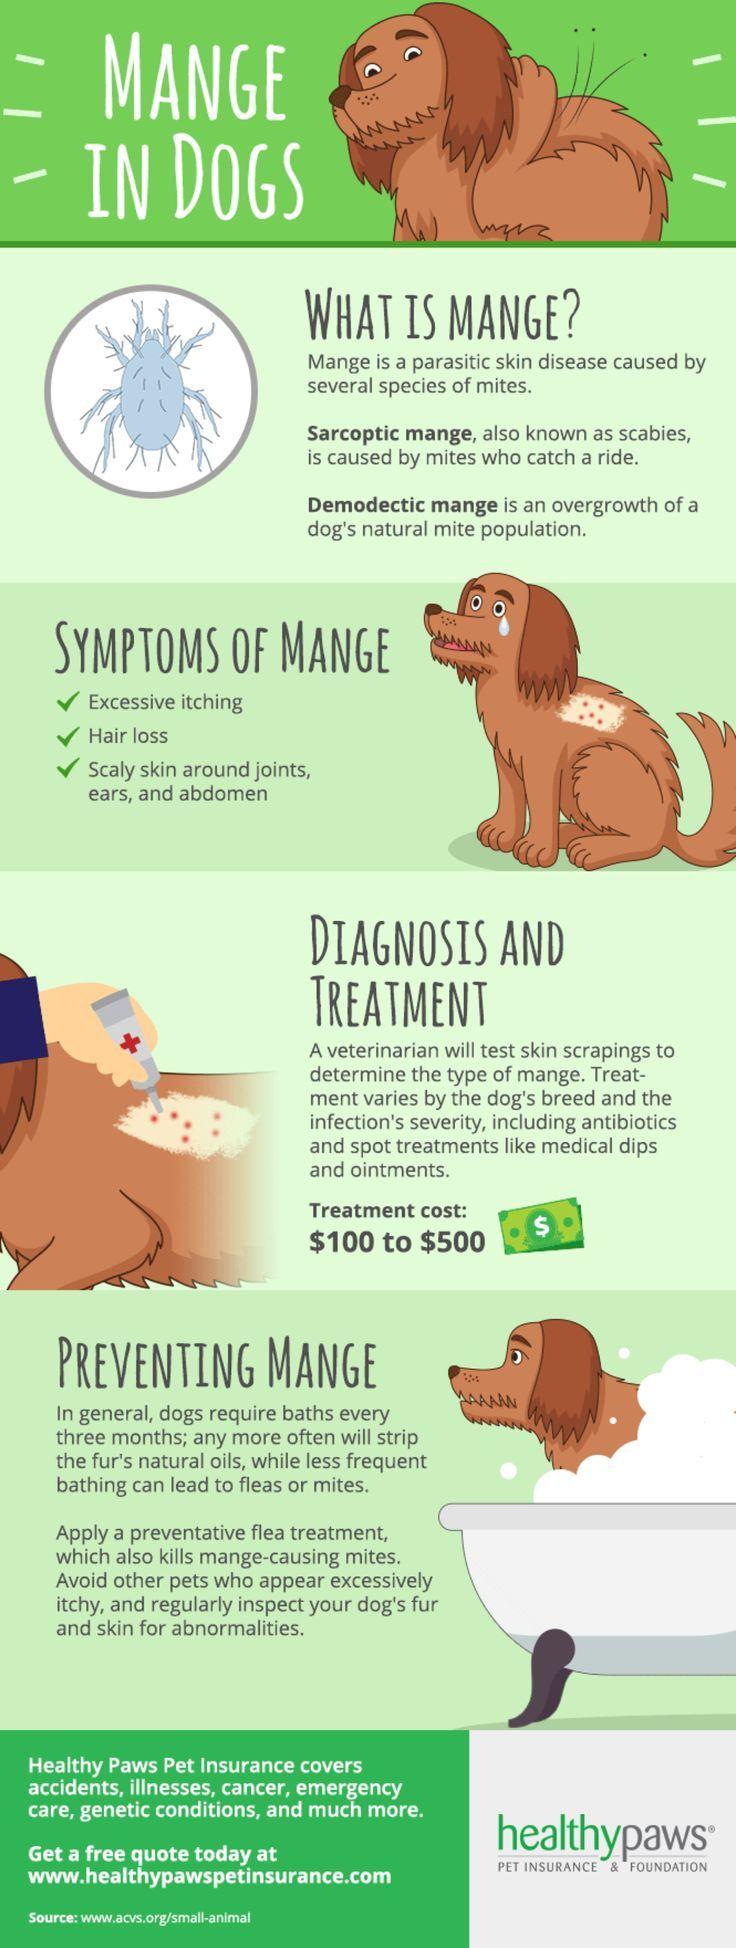 Deal with Mange in Canine The Touring Dogtor | Vet Pupil Weblog